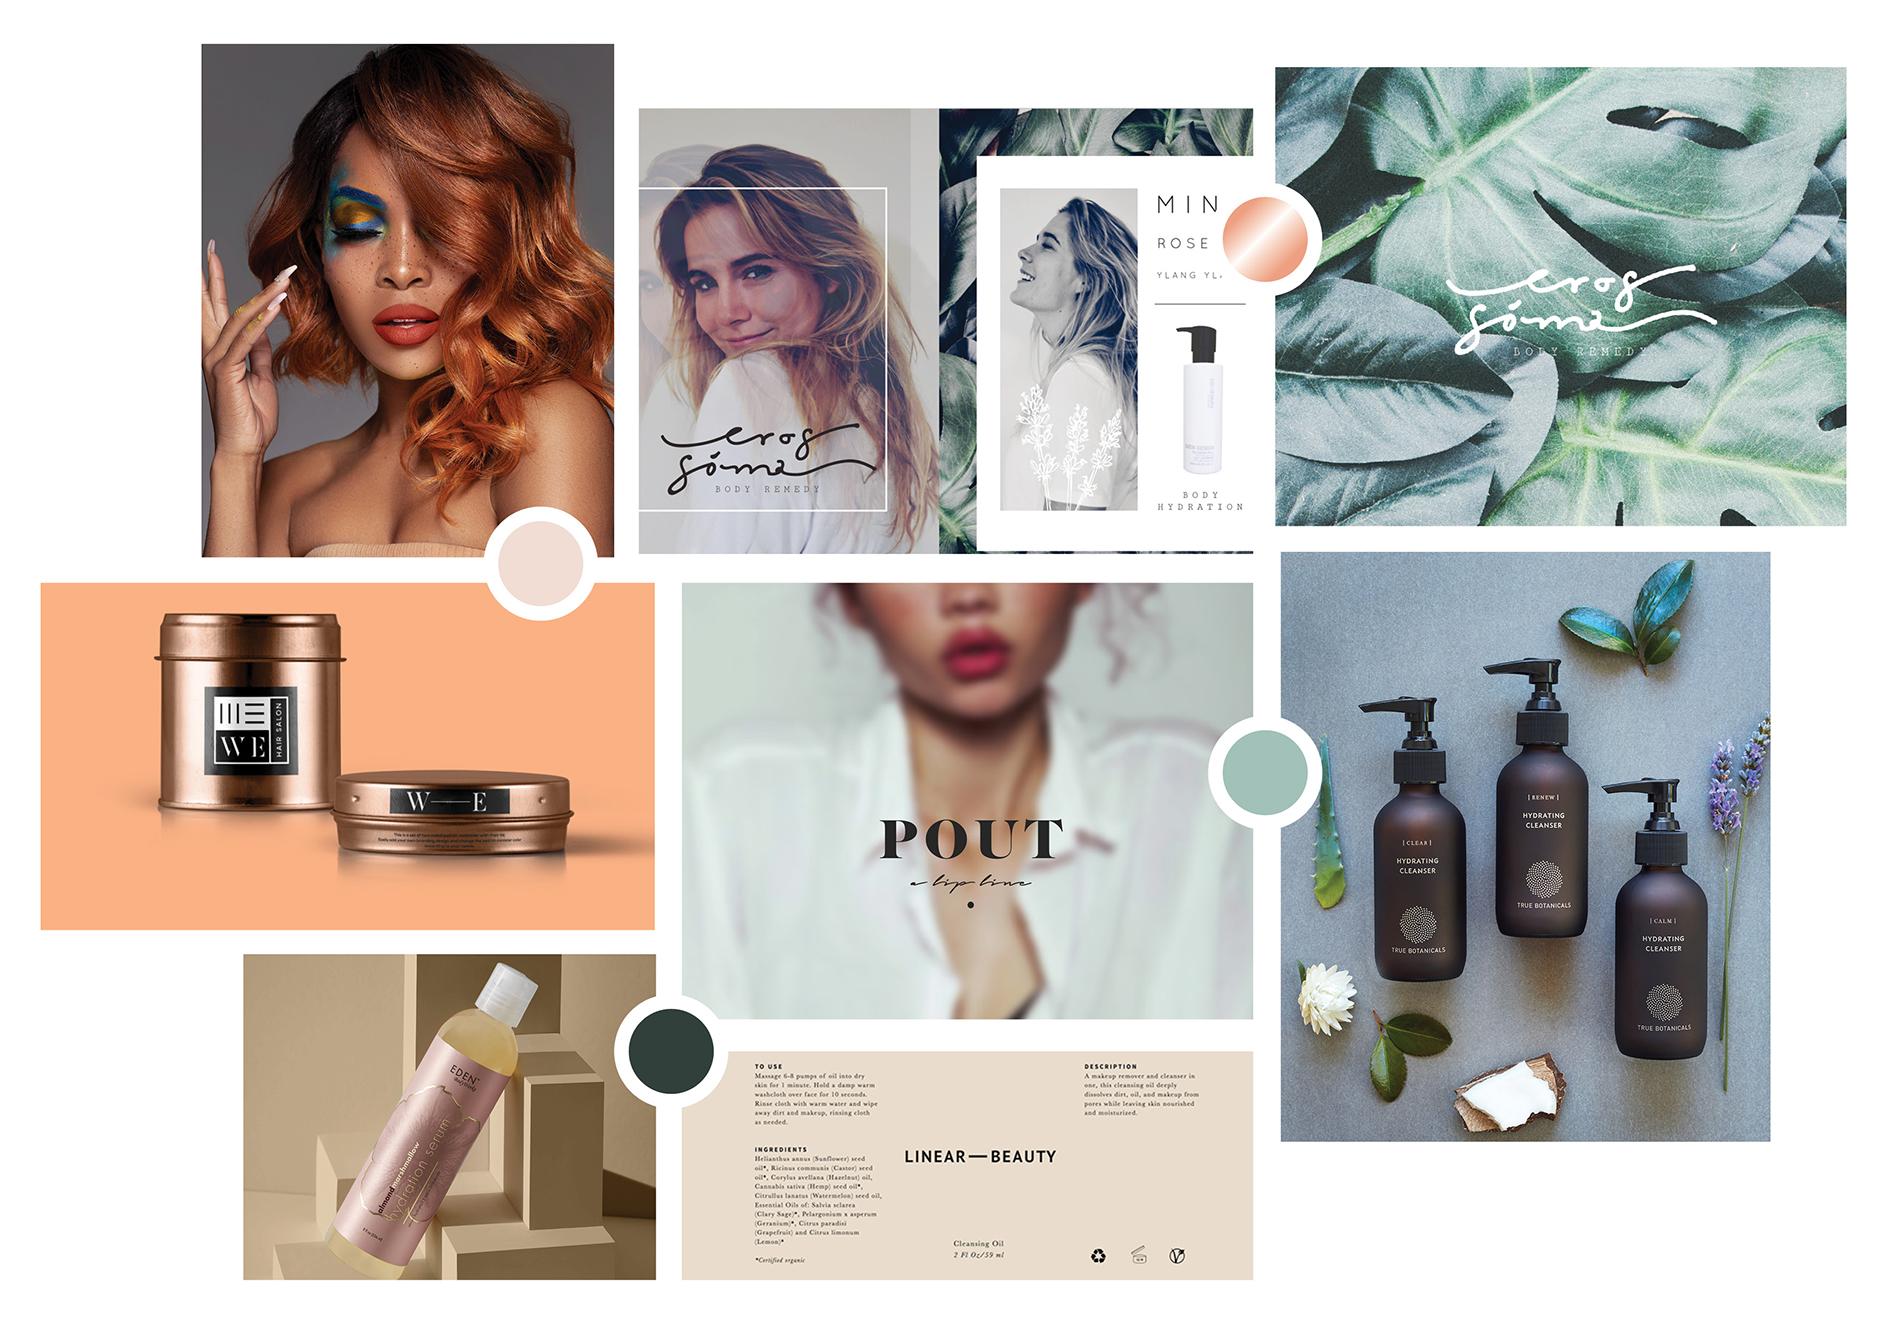 Dellarose Official - Look Book3.jpg